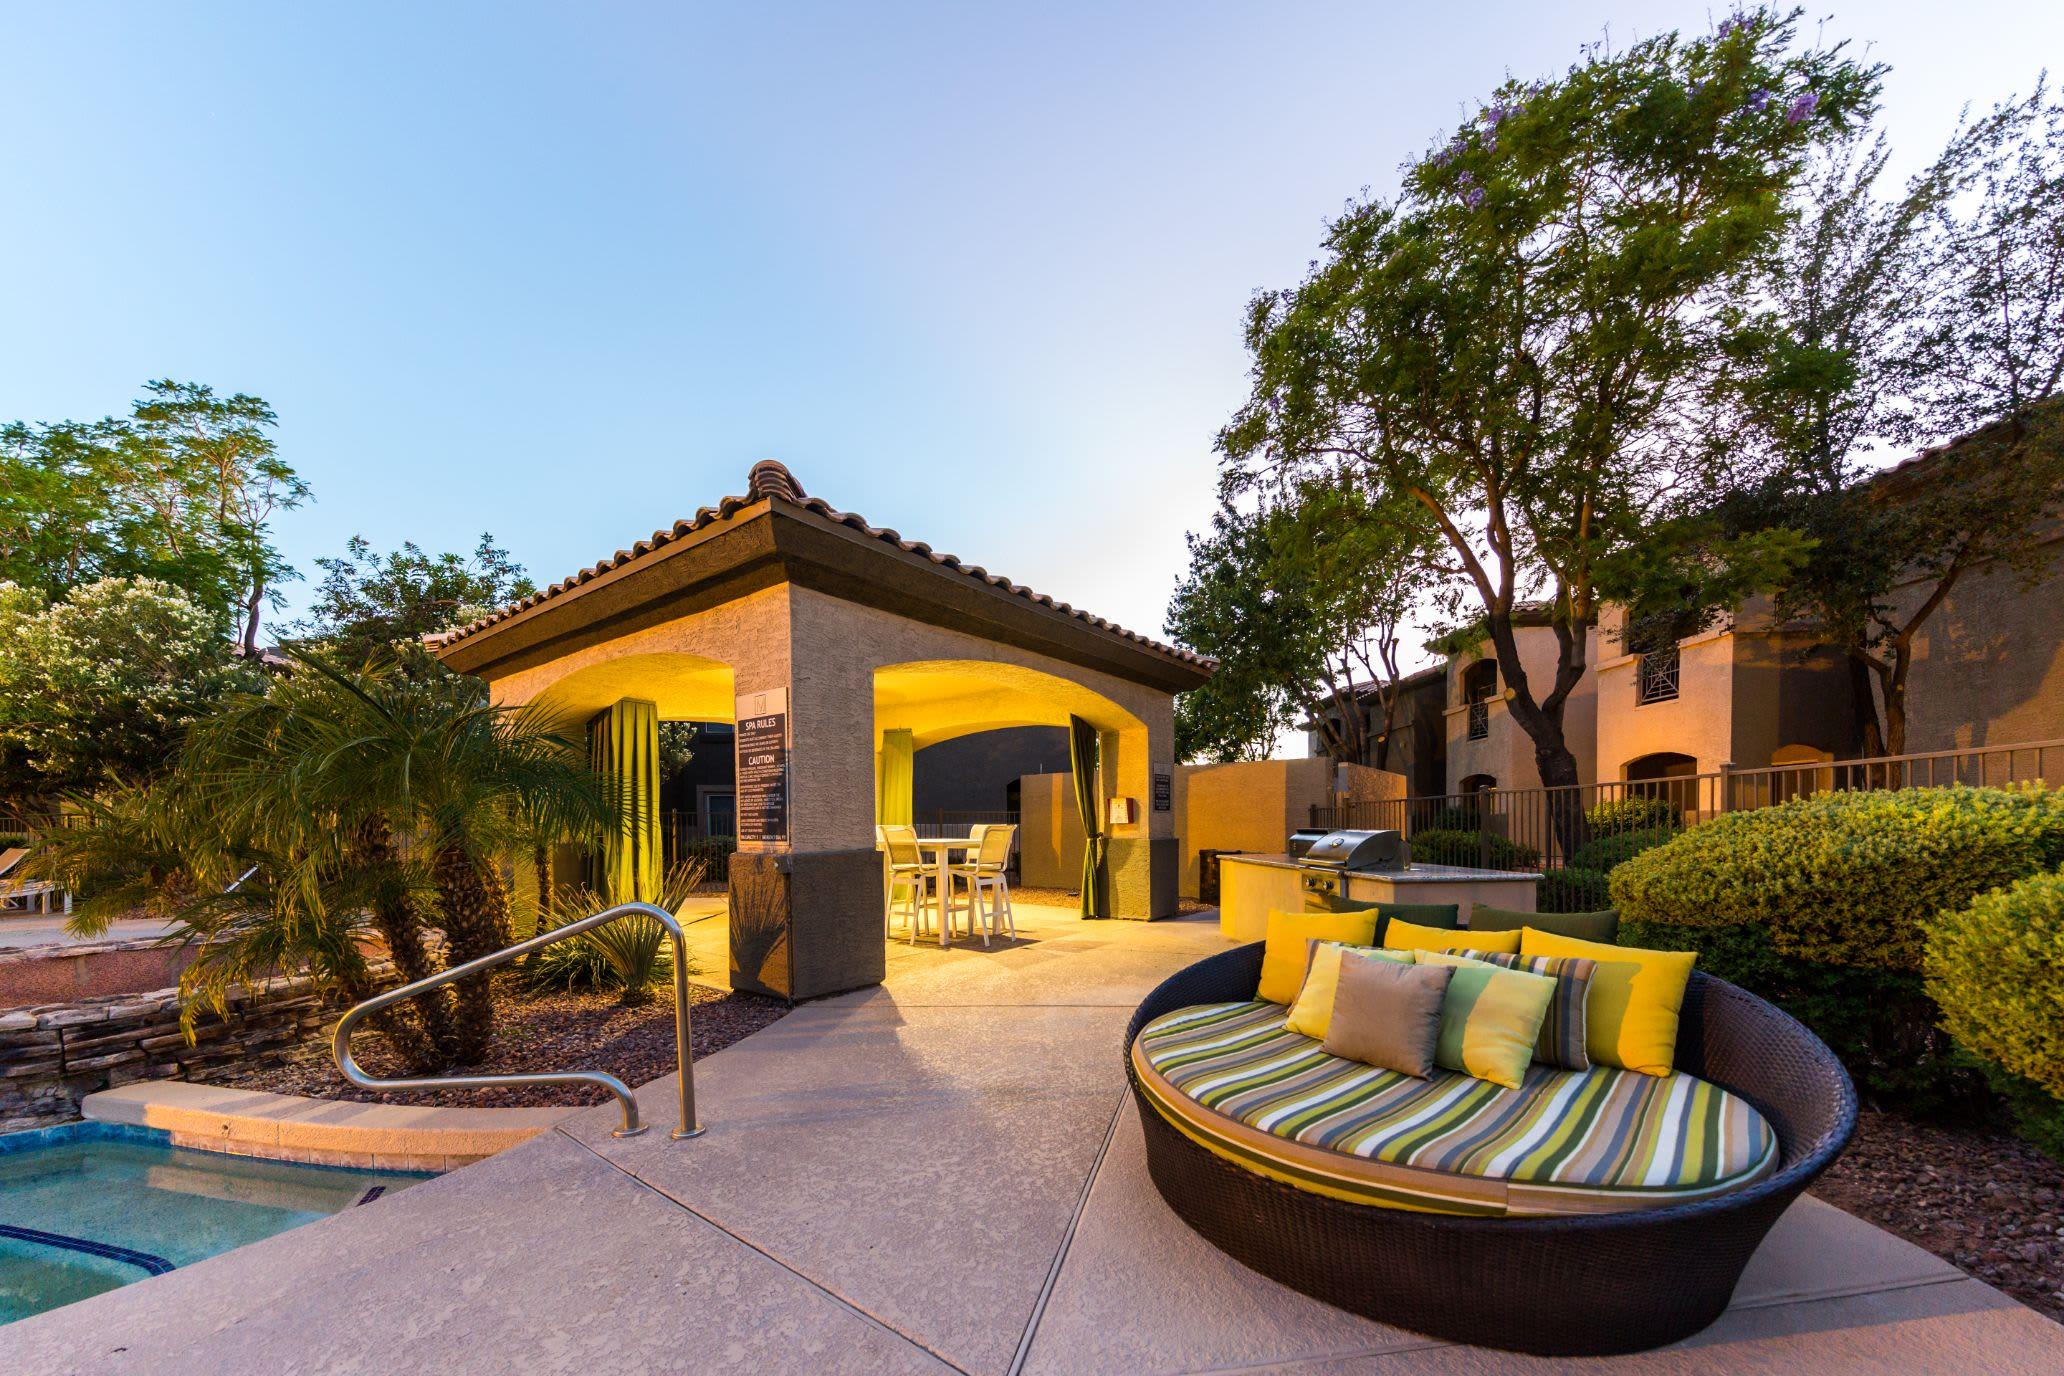 Gazebo near pool at dusk at Marquis at Arrowhead in Peoria, Arizona